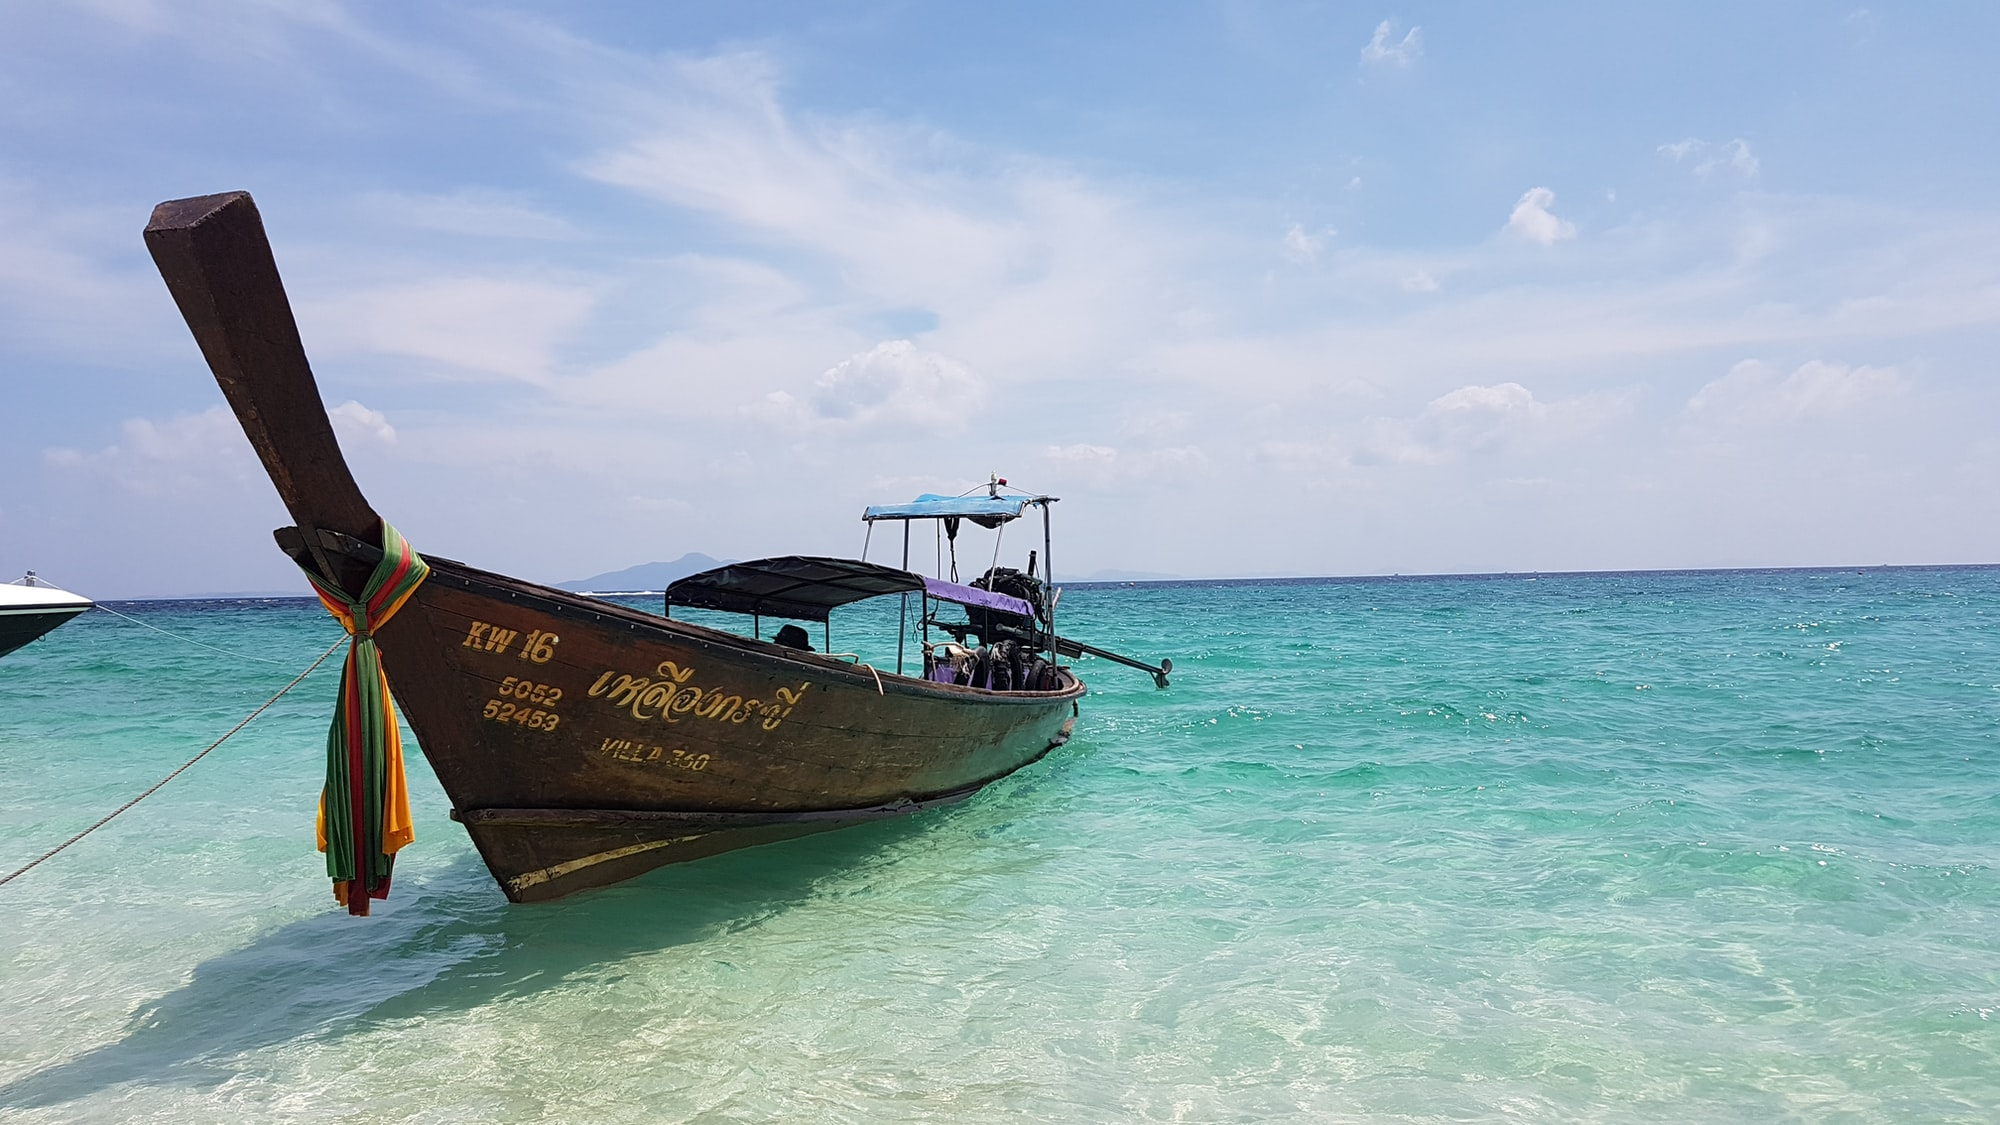 Thai style boat in Krabi, Thailand.